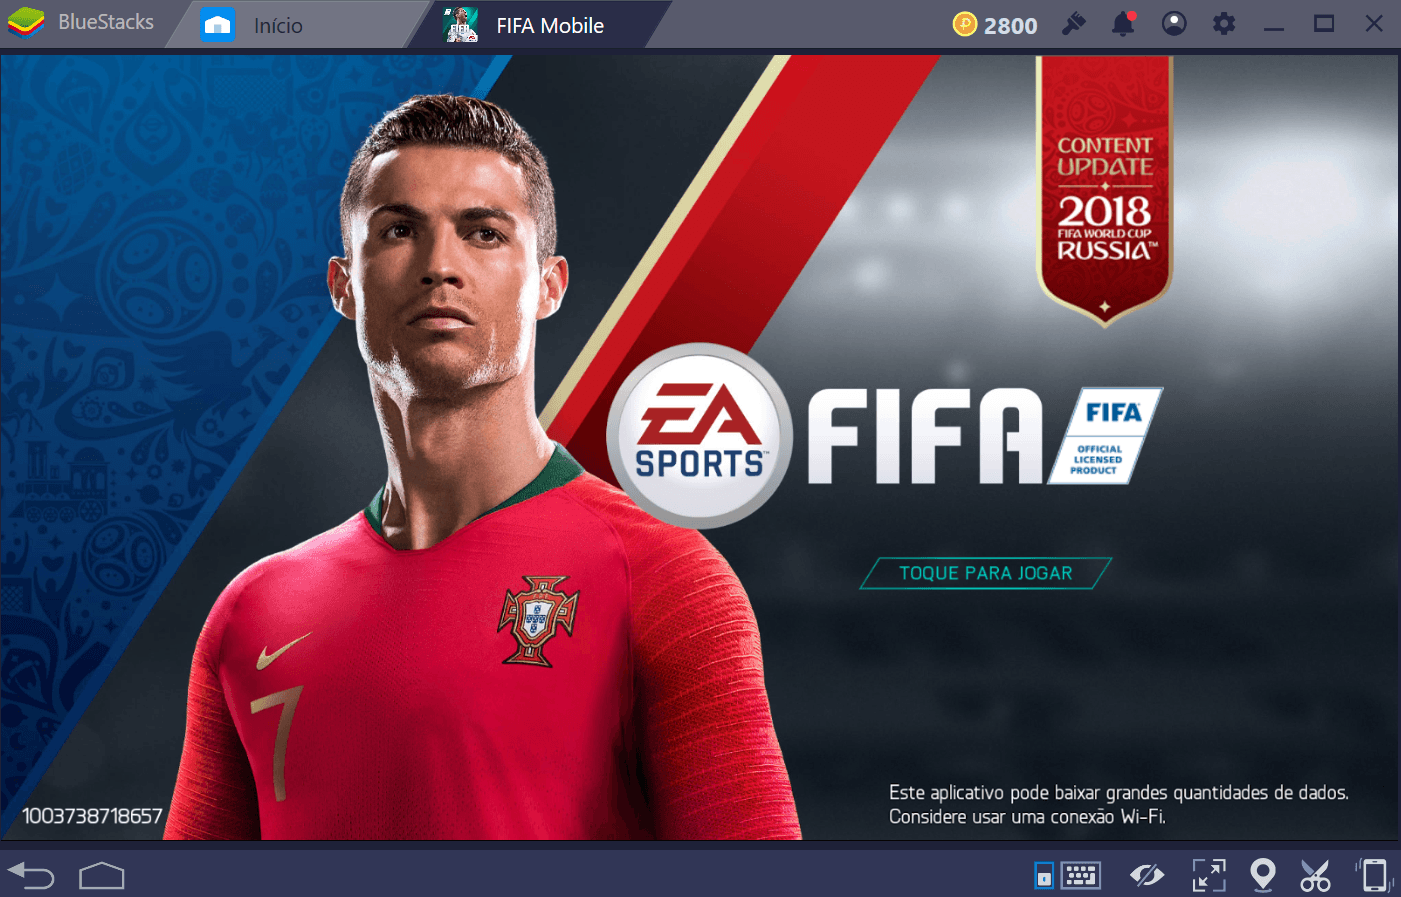 Como Futebol FIFA: FIFA World Cup (FIFA Mobile) entrega um game de futebol free-to-play